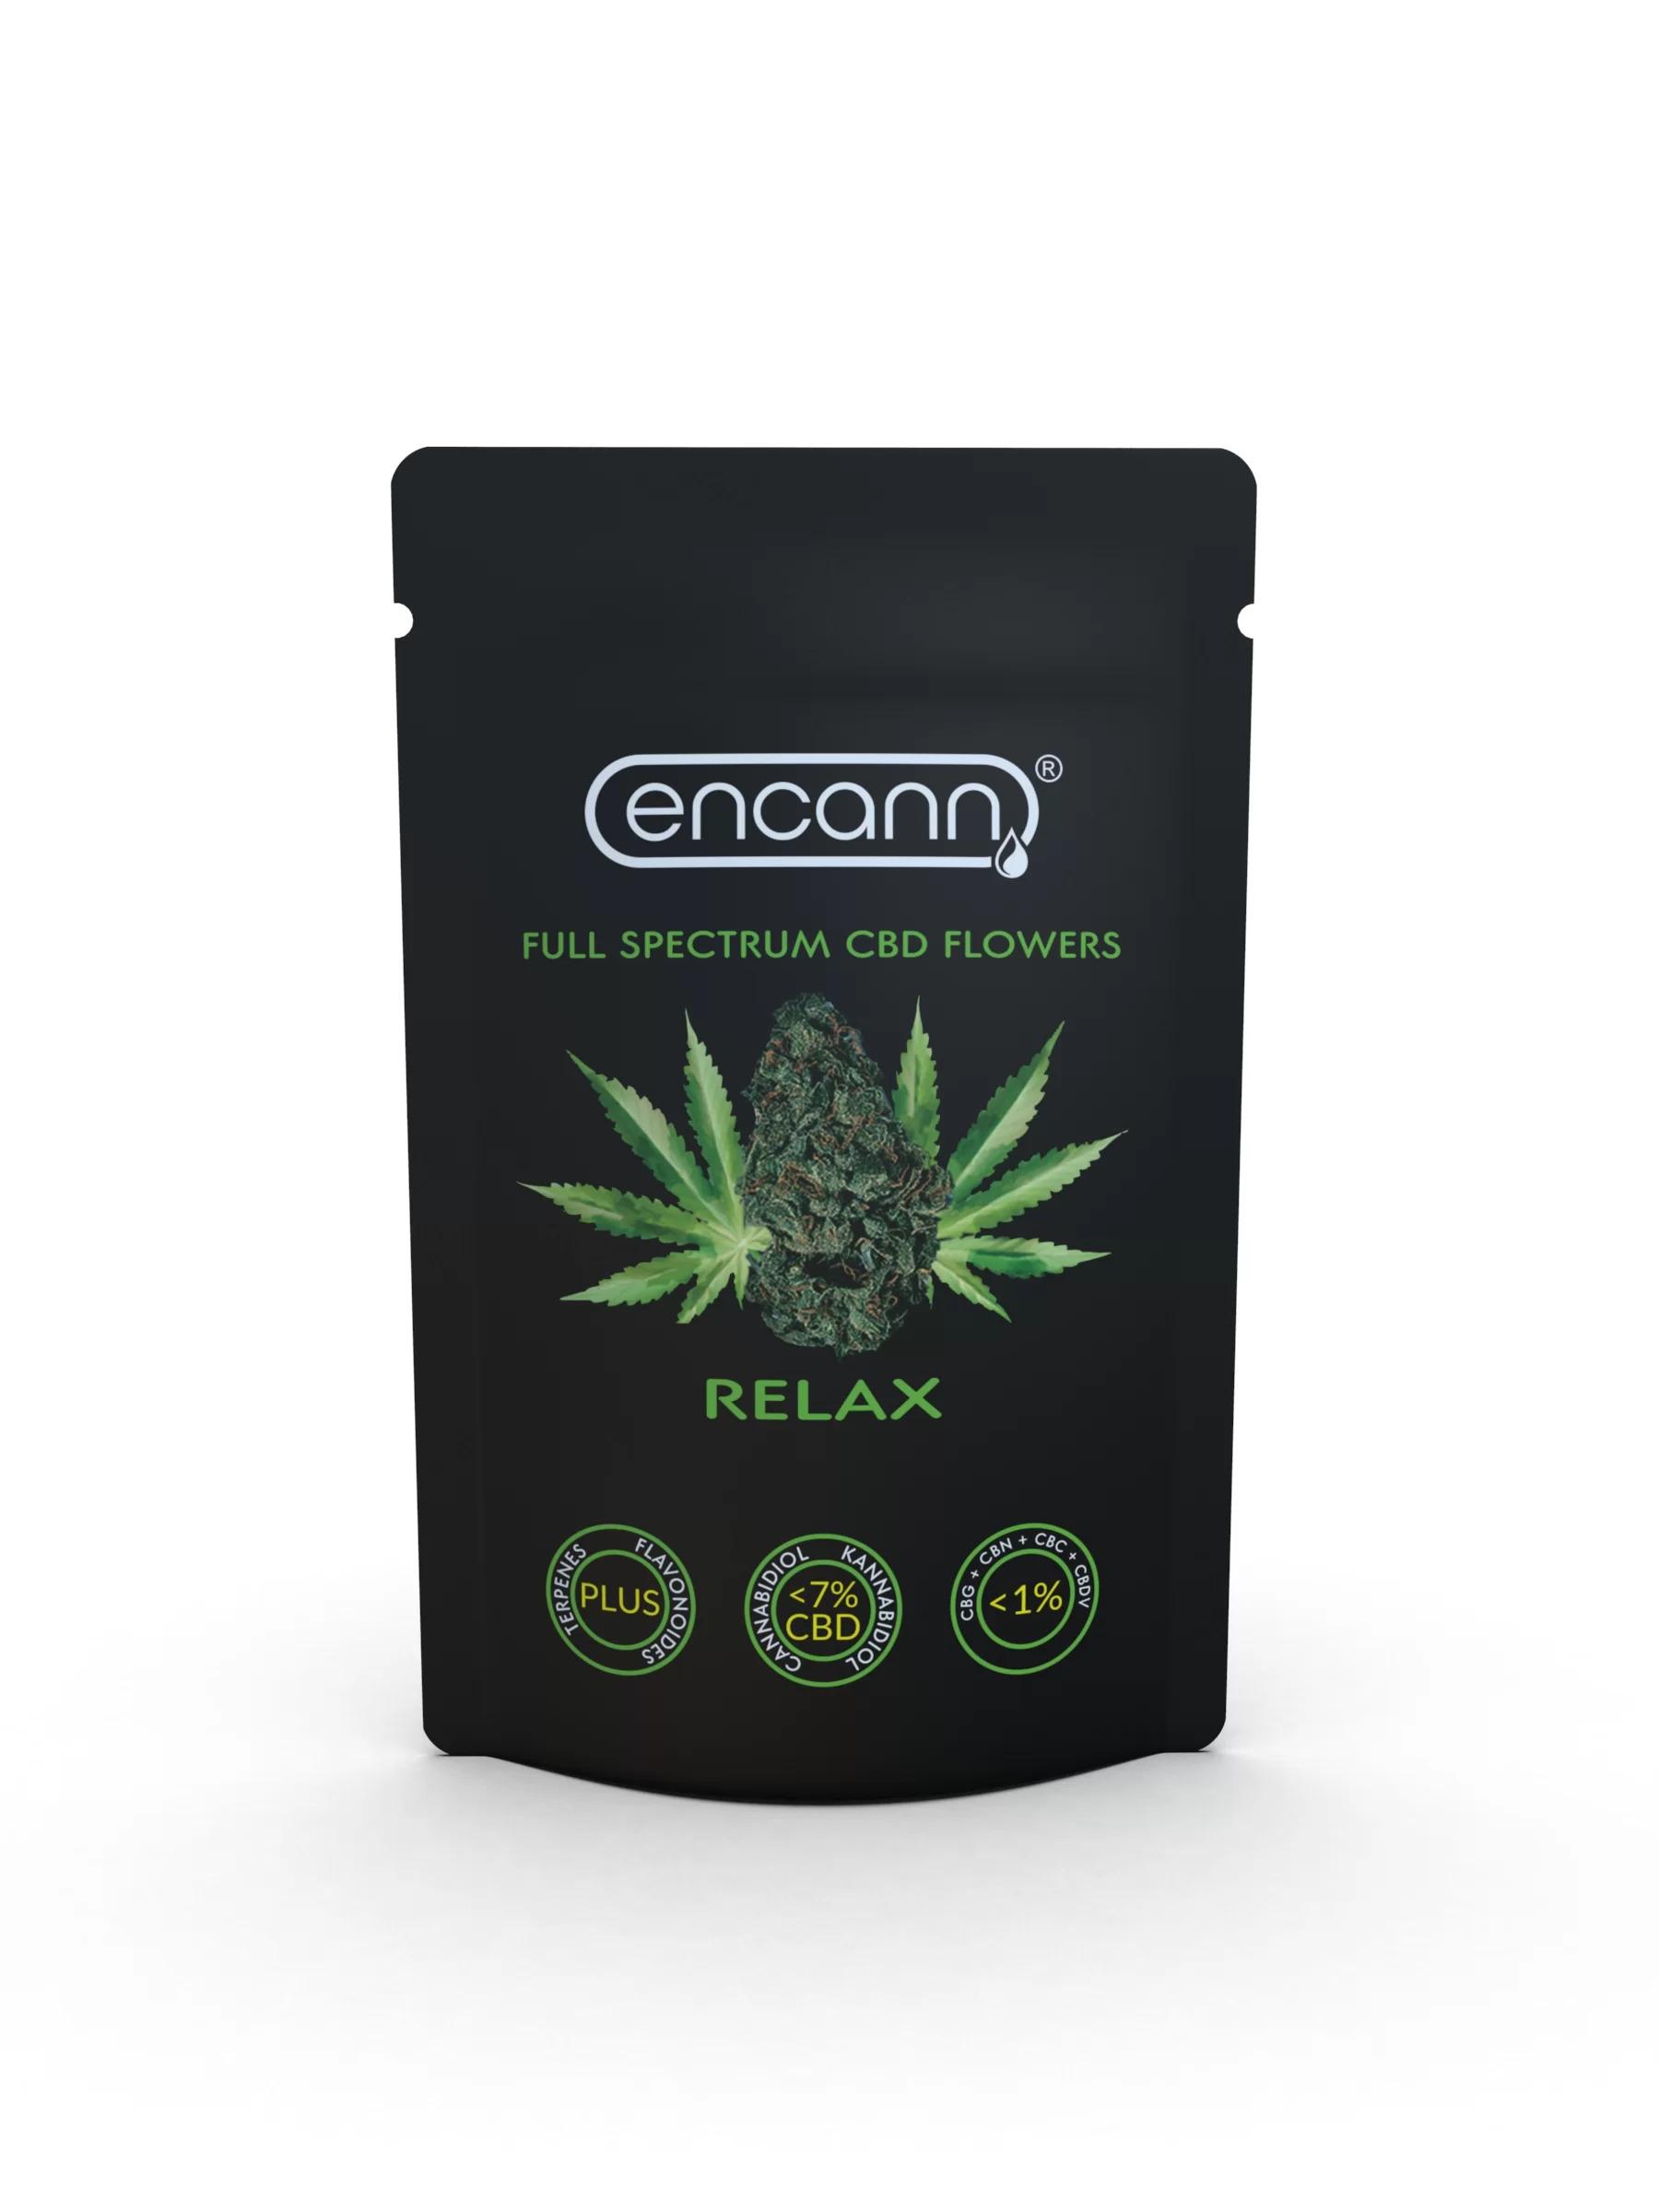 Susz konopny Relax ~7% CBD 1g Encann